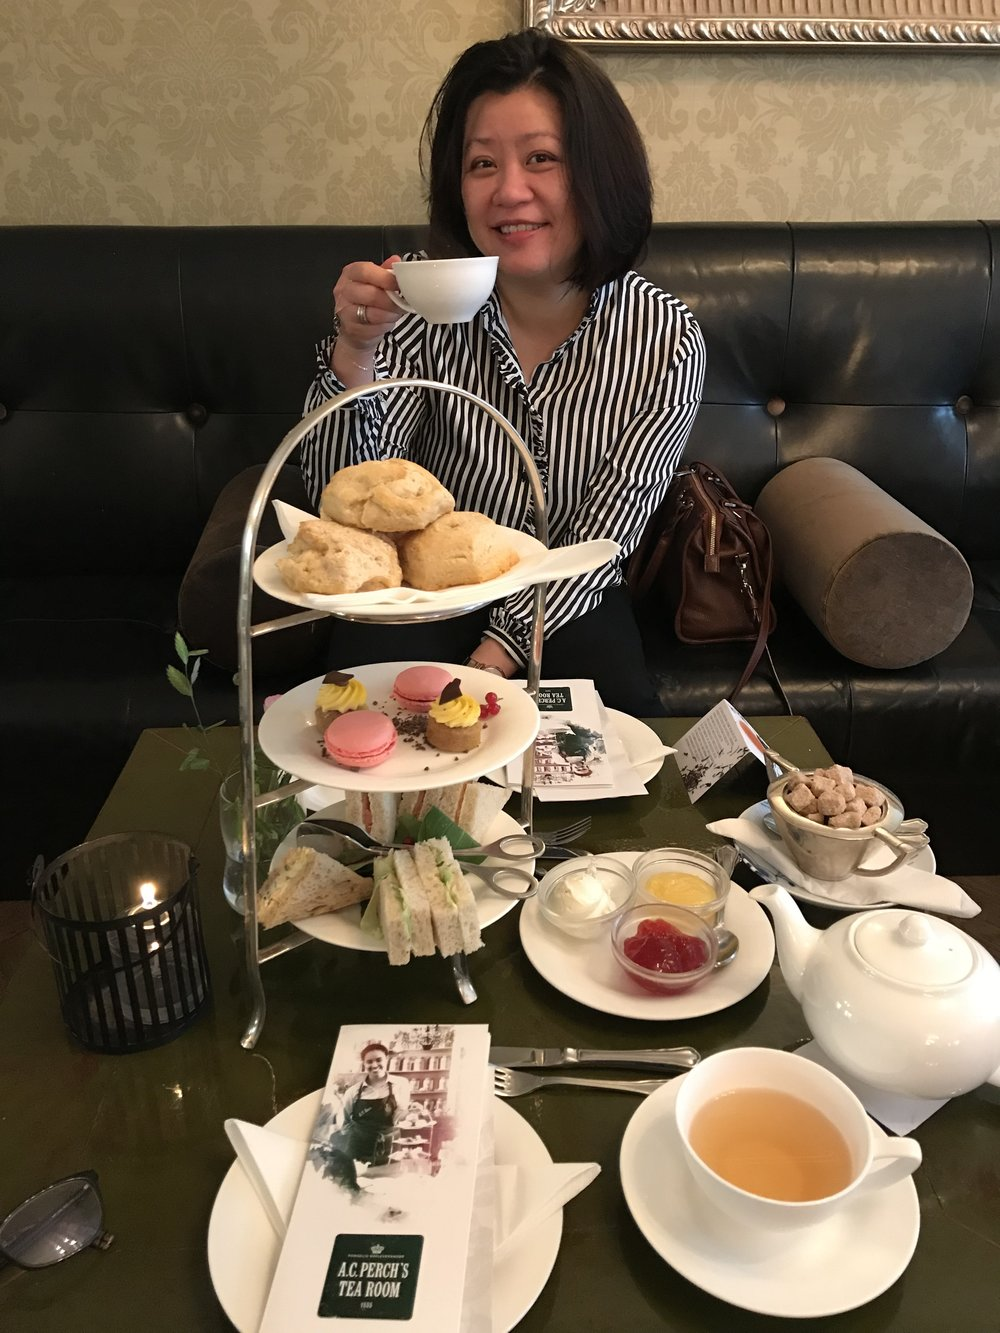 My friend My enjoying her tea - great company always.